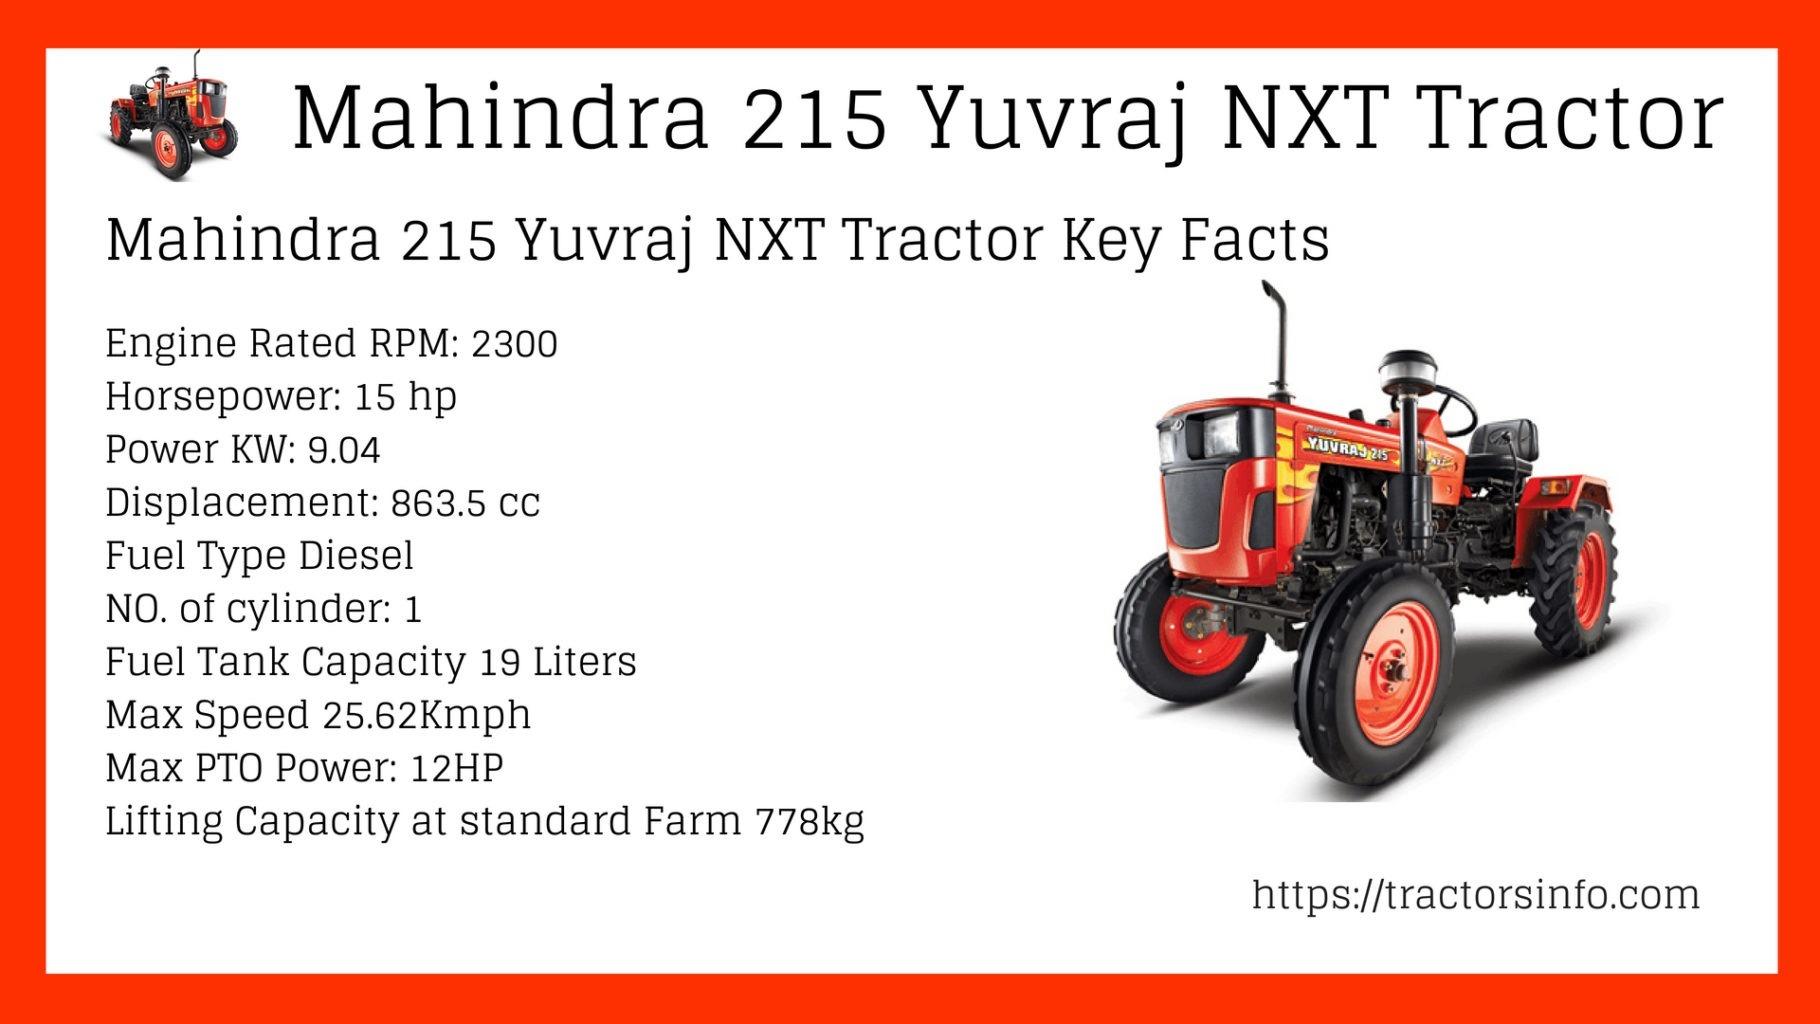 Mahindra-215-Yuvraj-NXT-Tractor